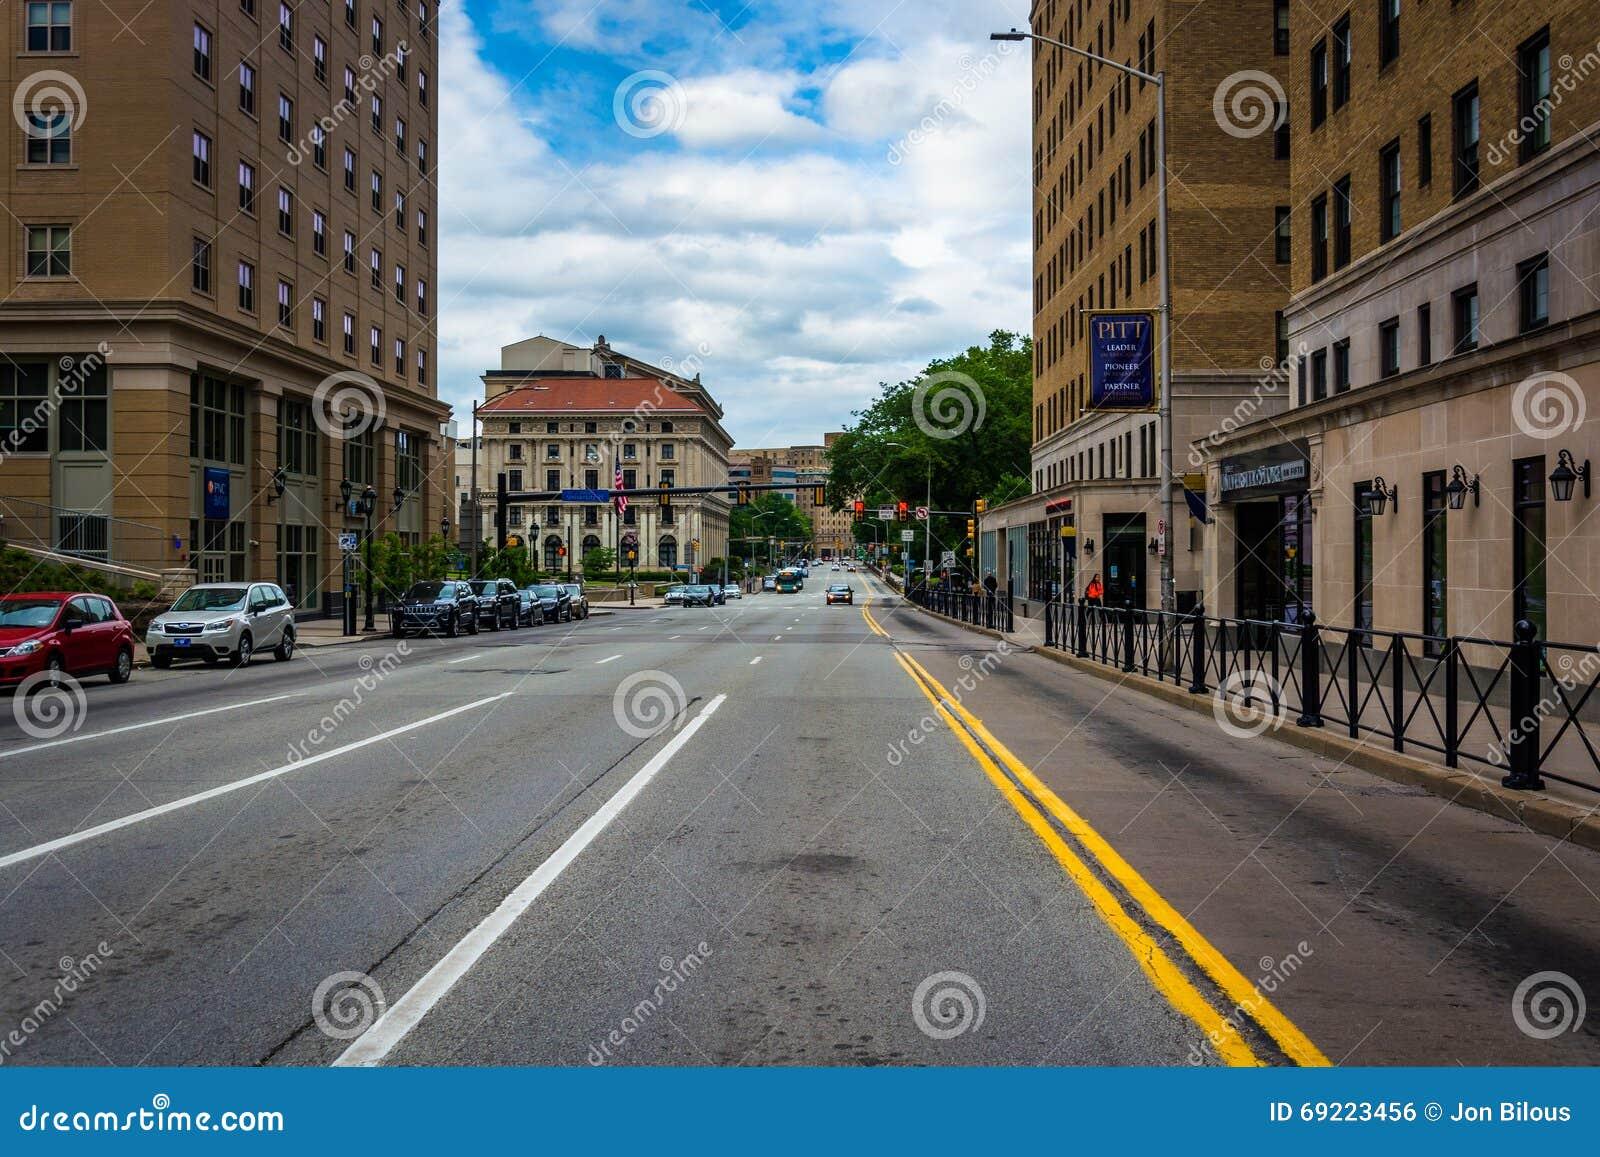 Calle en la universidad de Pittsburgh, en Pittsburgh, Pennsylva